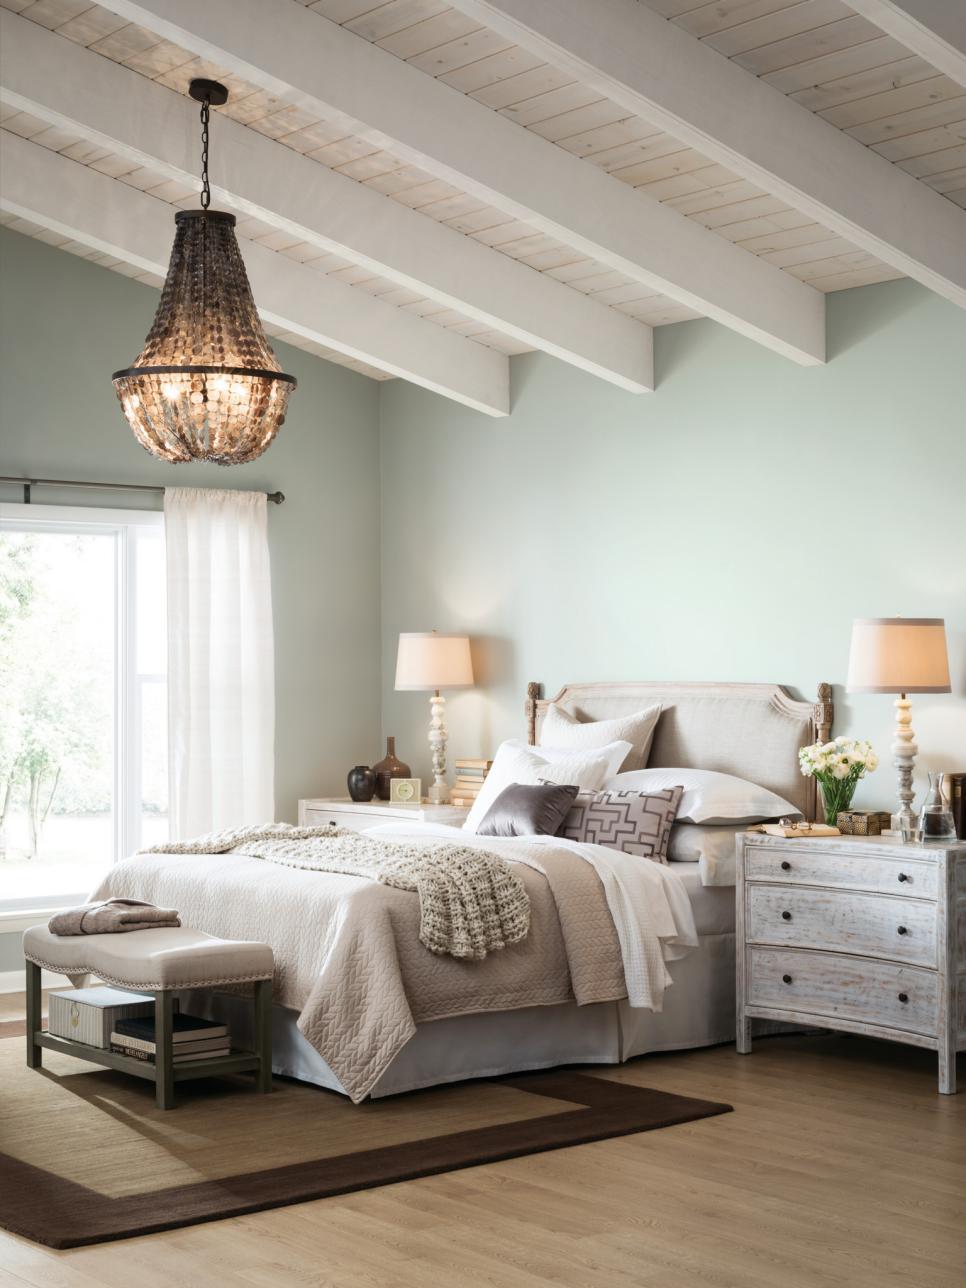 25 master bedroom decorating ideas designs design trends - 25 Master Bedroom Decorating Ideas Designs Design Trends 5